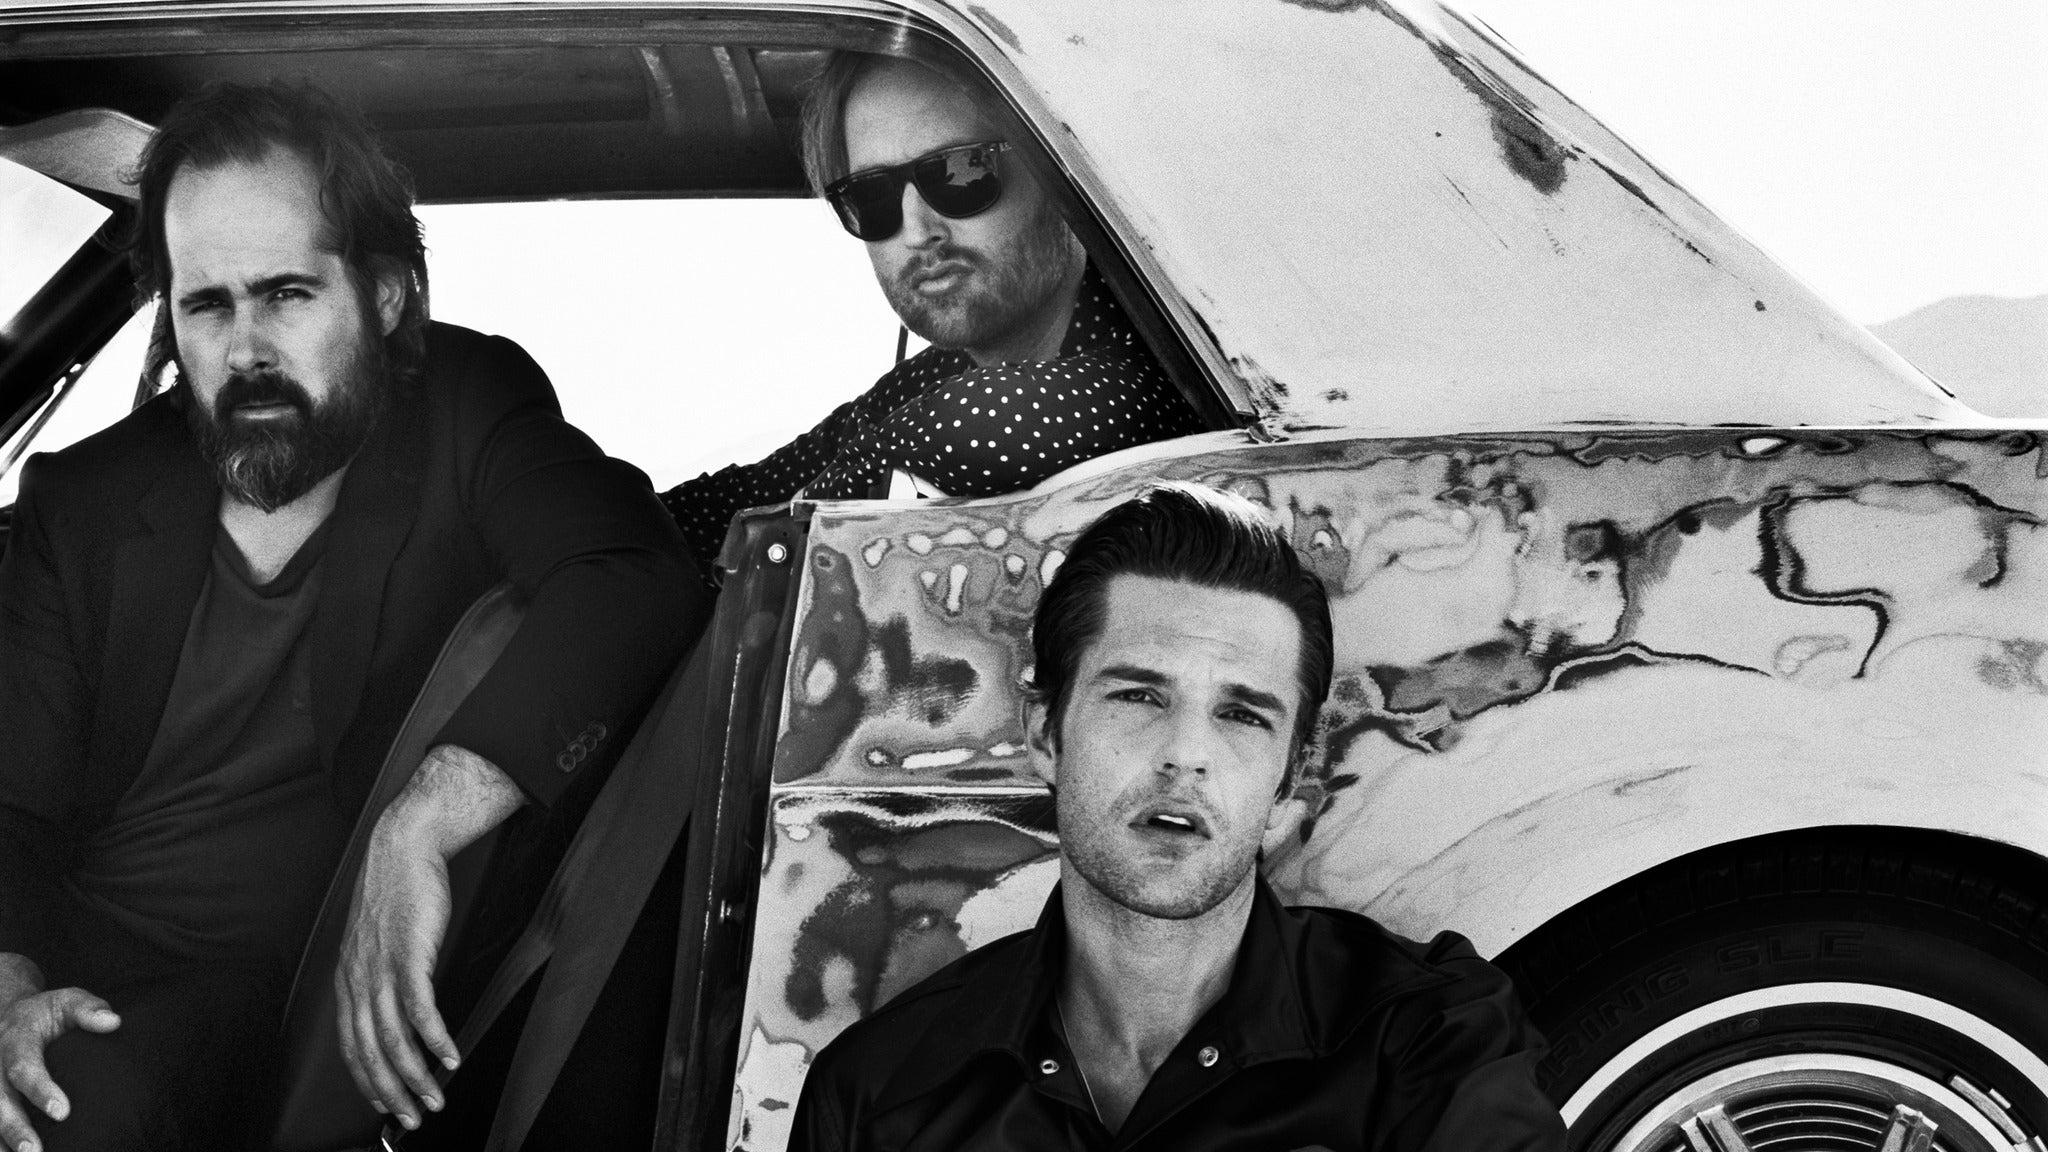 The Killers at Infinite Energy Arena